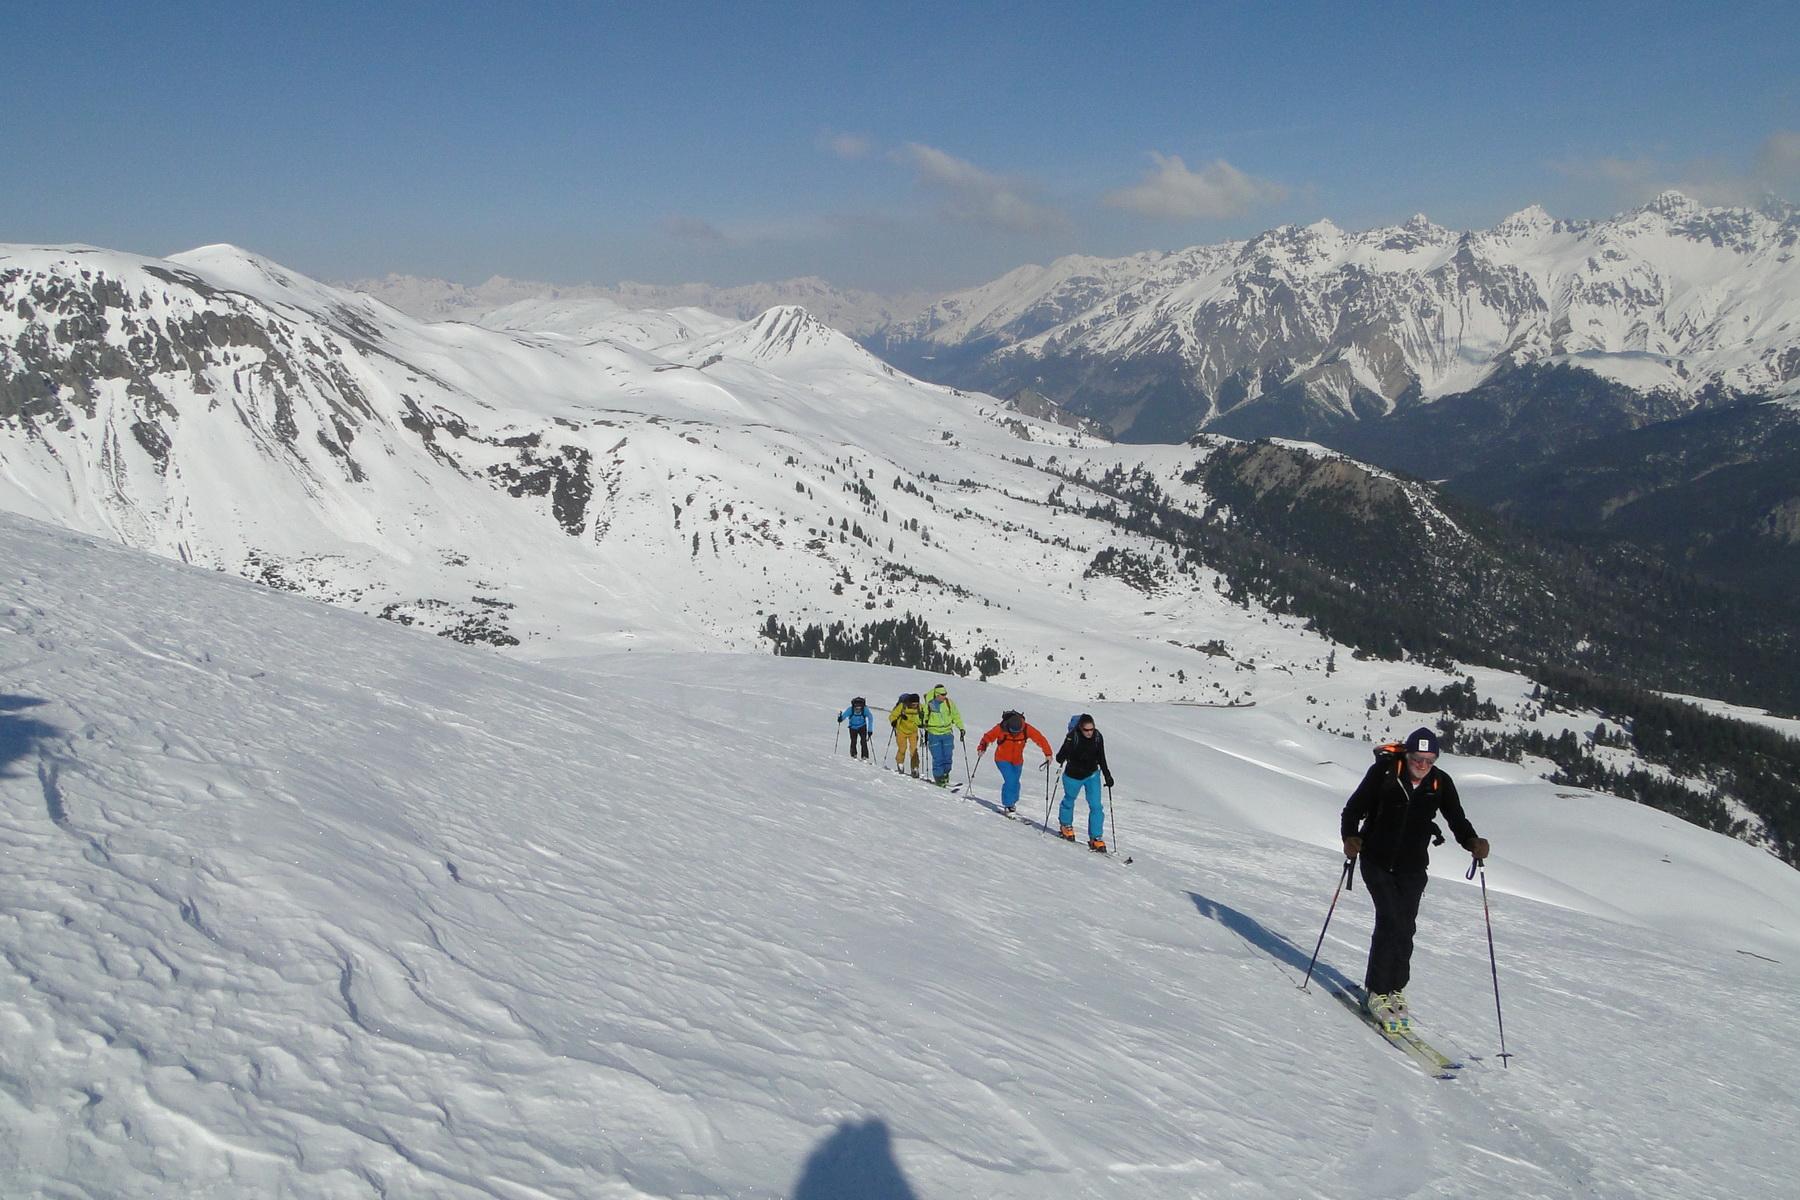 Skitourentage Piz Daint 26.03.2017